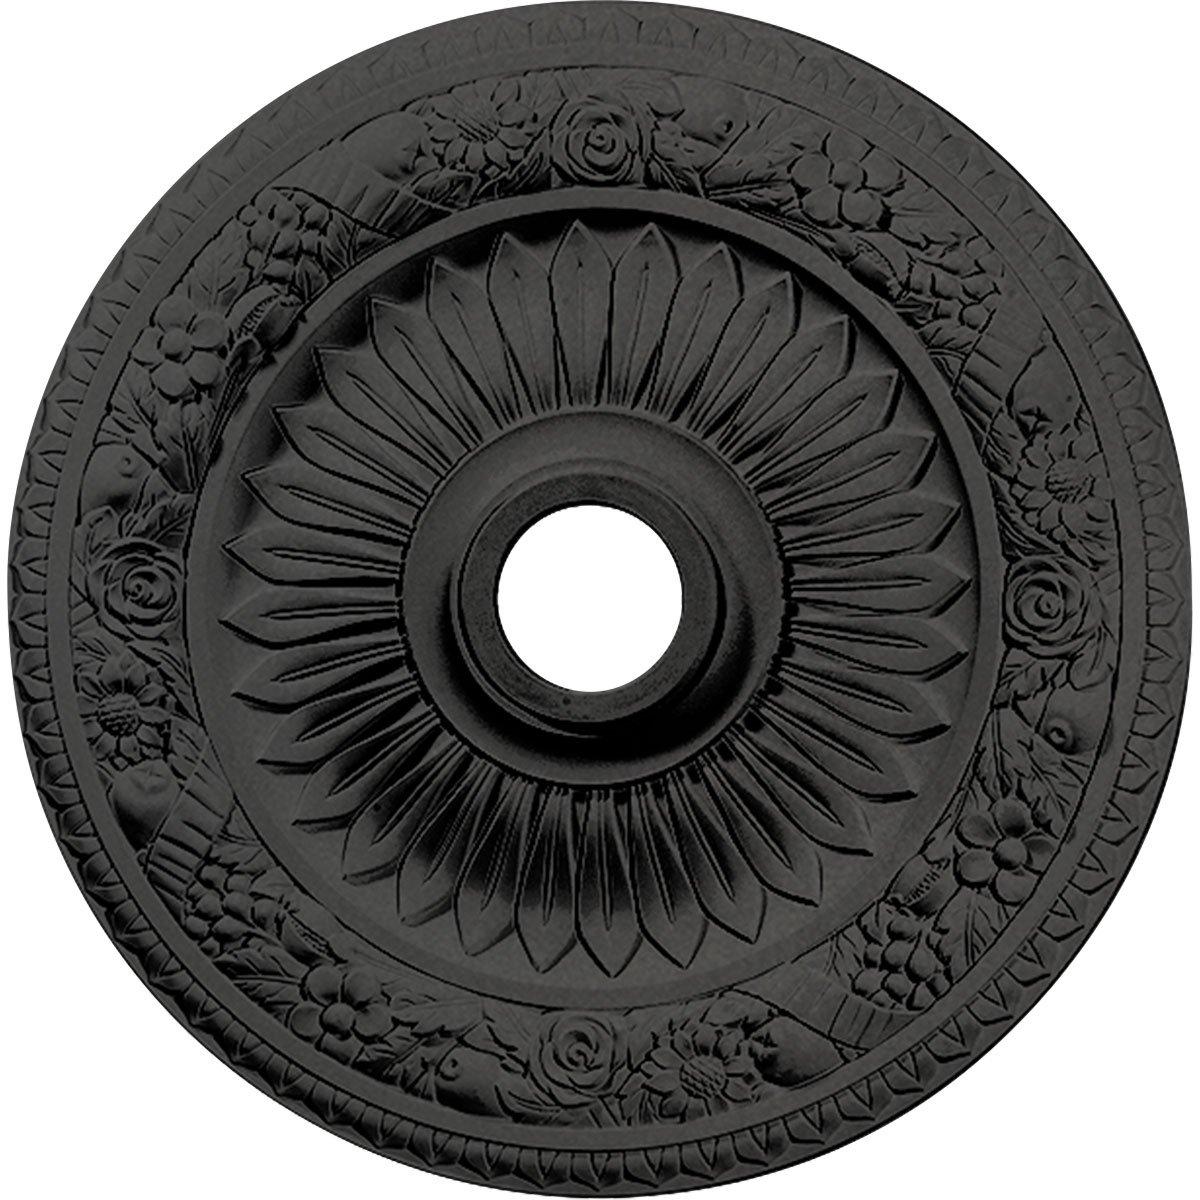 Ekena Millwork CM23BESGS 23-5/8'' x 3-5/8'' x 1-1/8'' Bellona Ceiling Medallion, Steel Gray